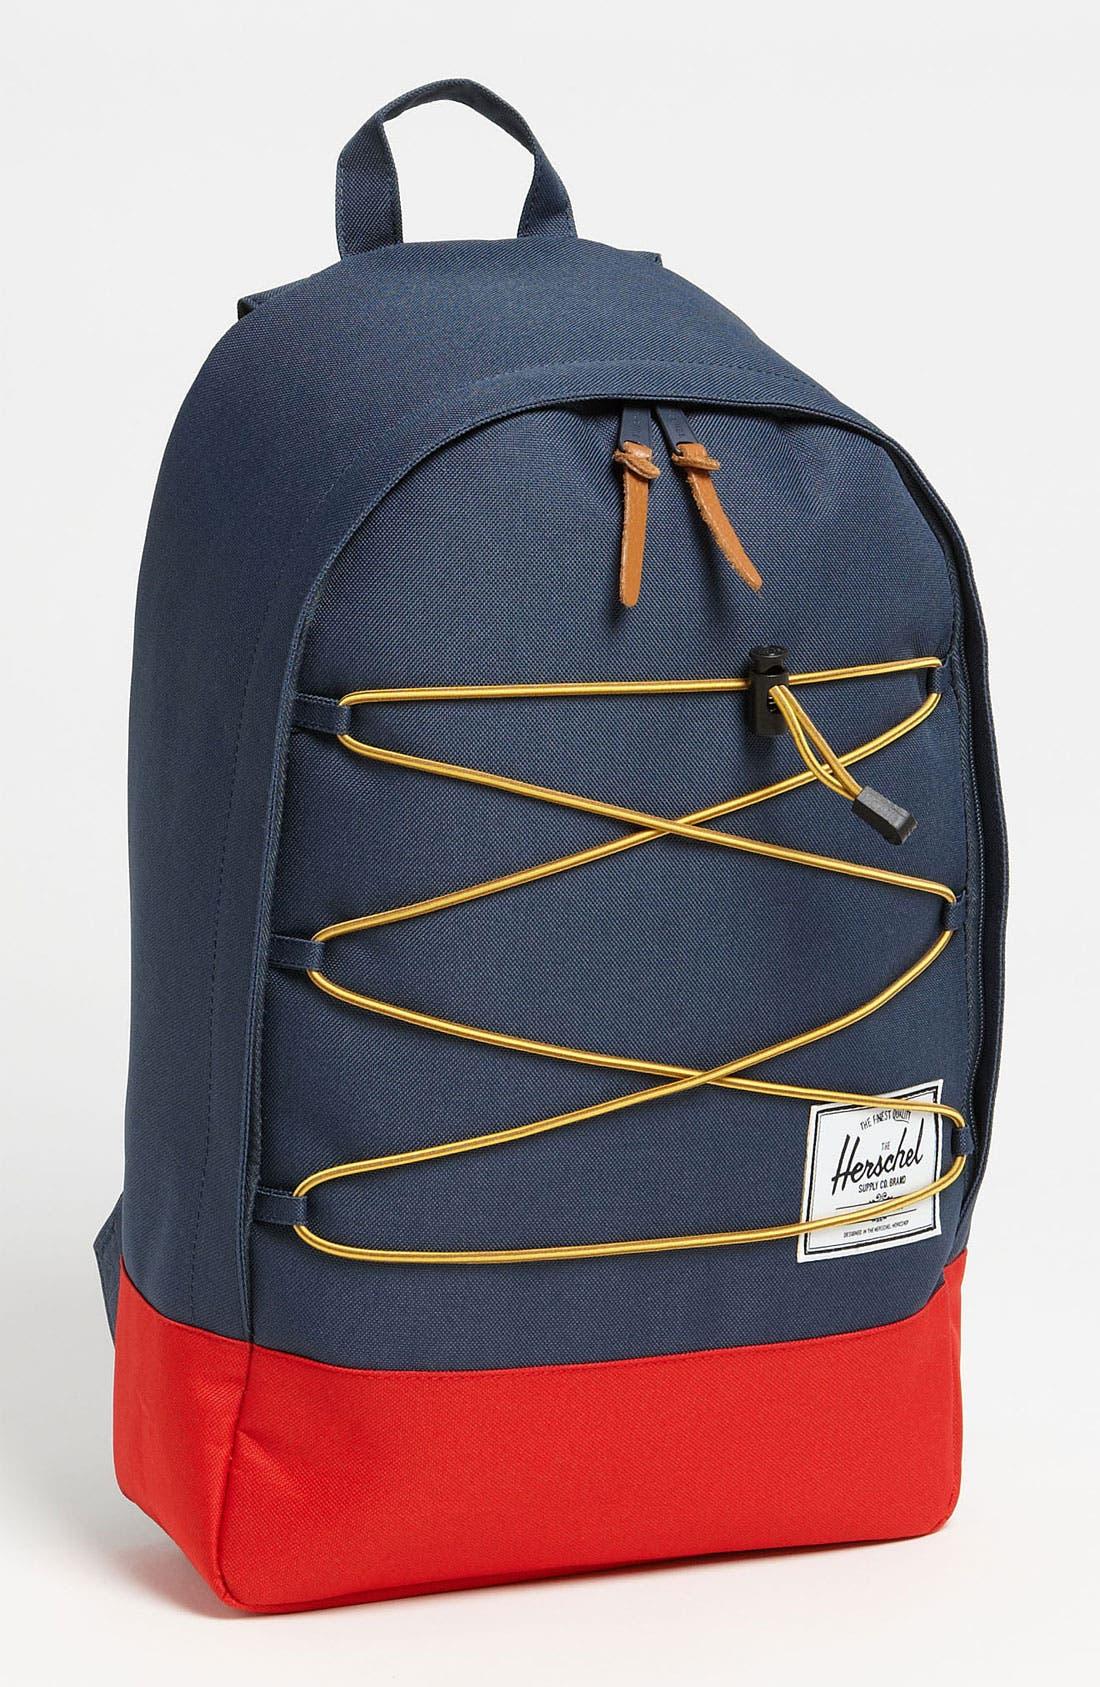 Main Image - Herschel Supply Co. 'Quarry' Backpack